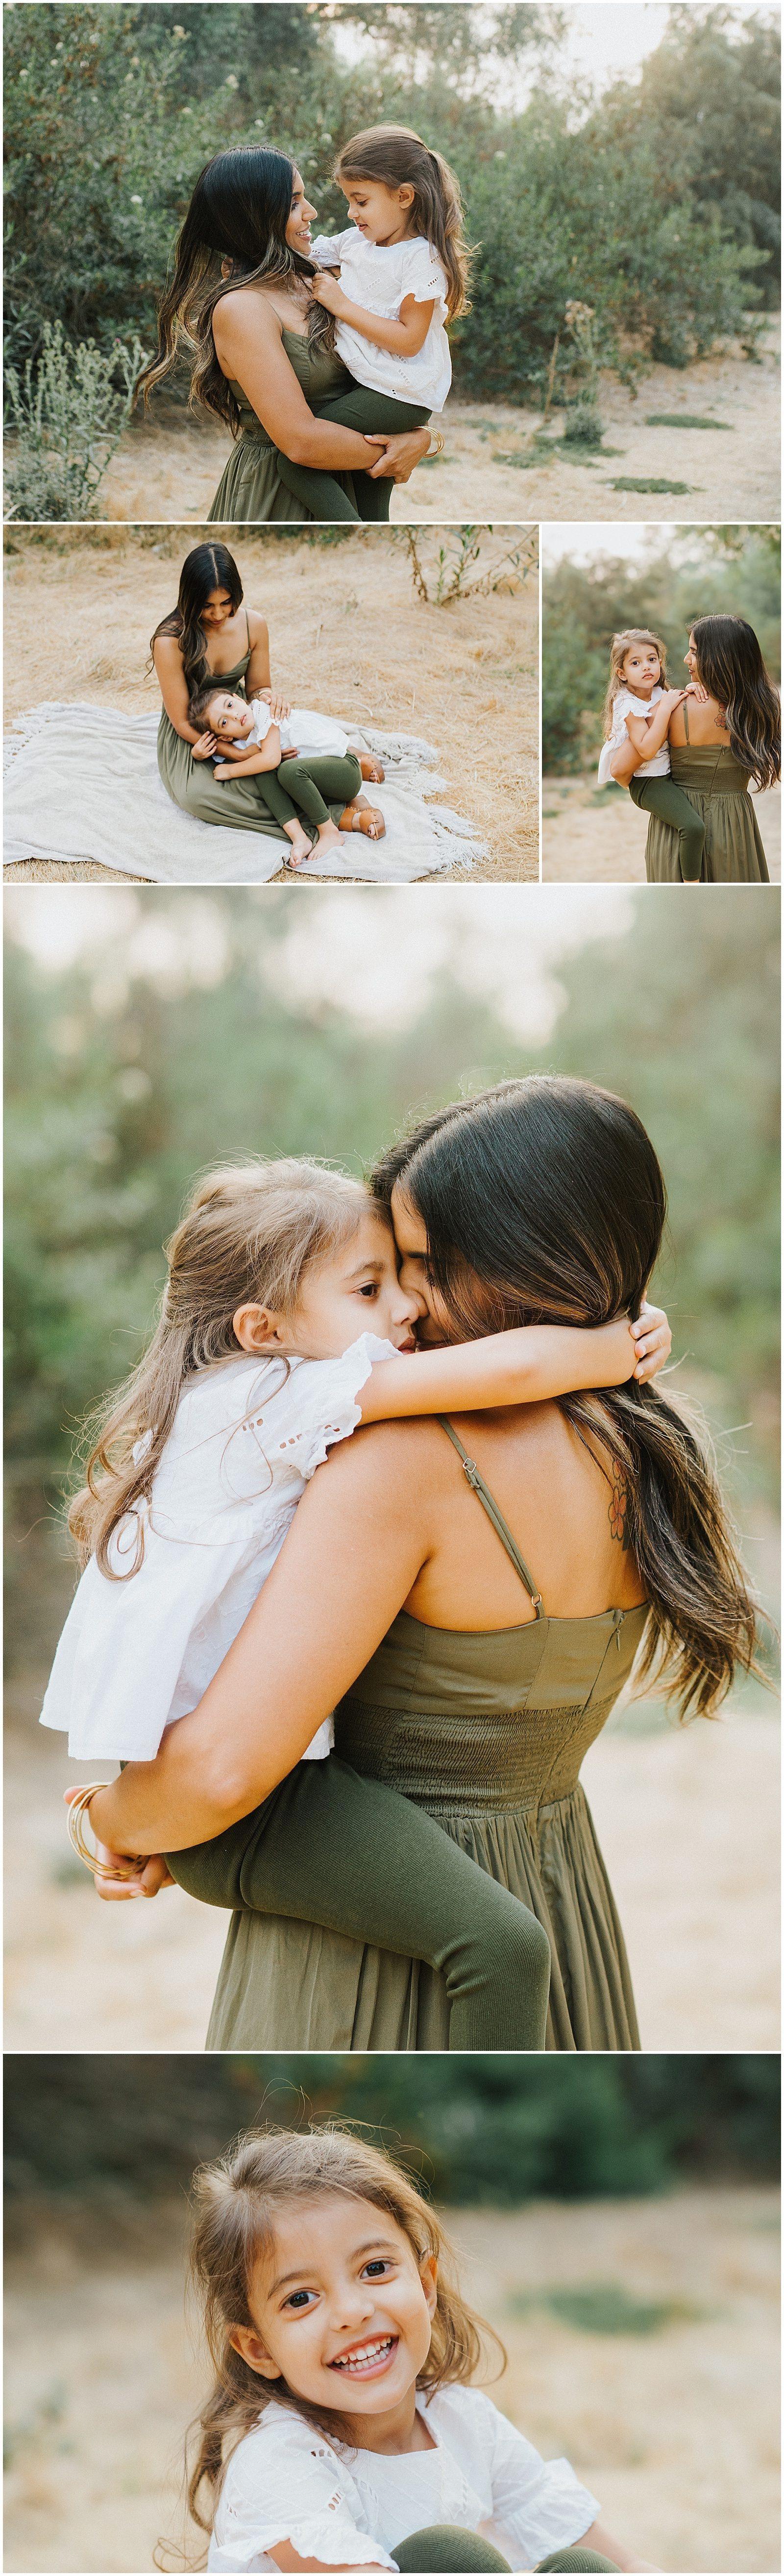 Orange County Family Photographer Sonja Hammad Photography 0350